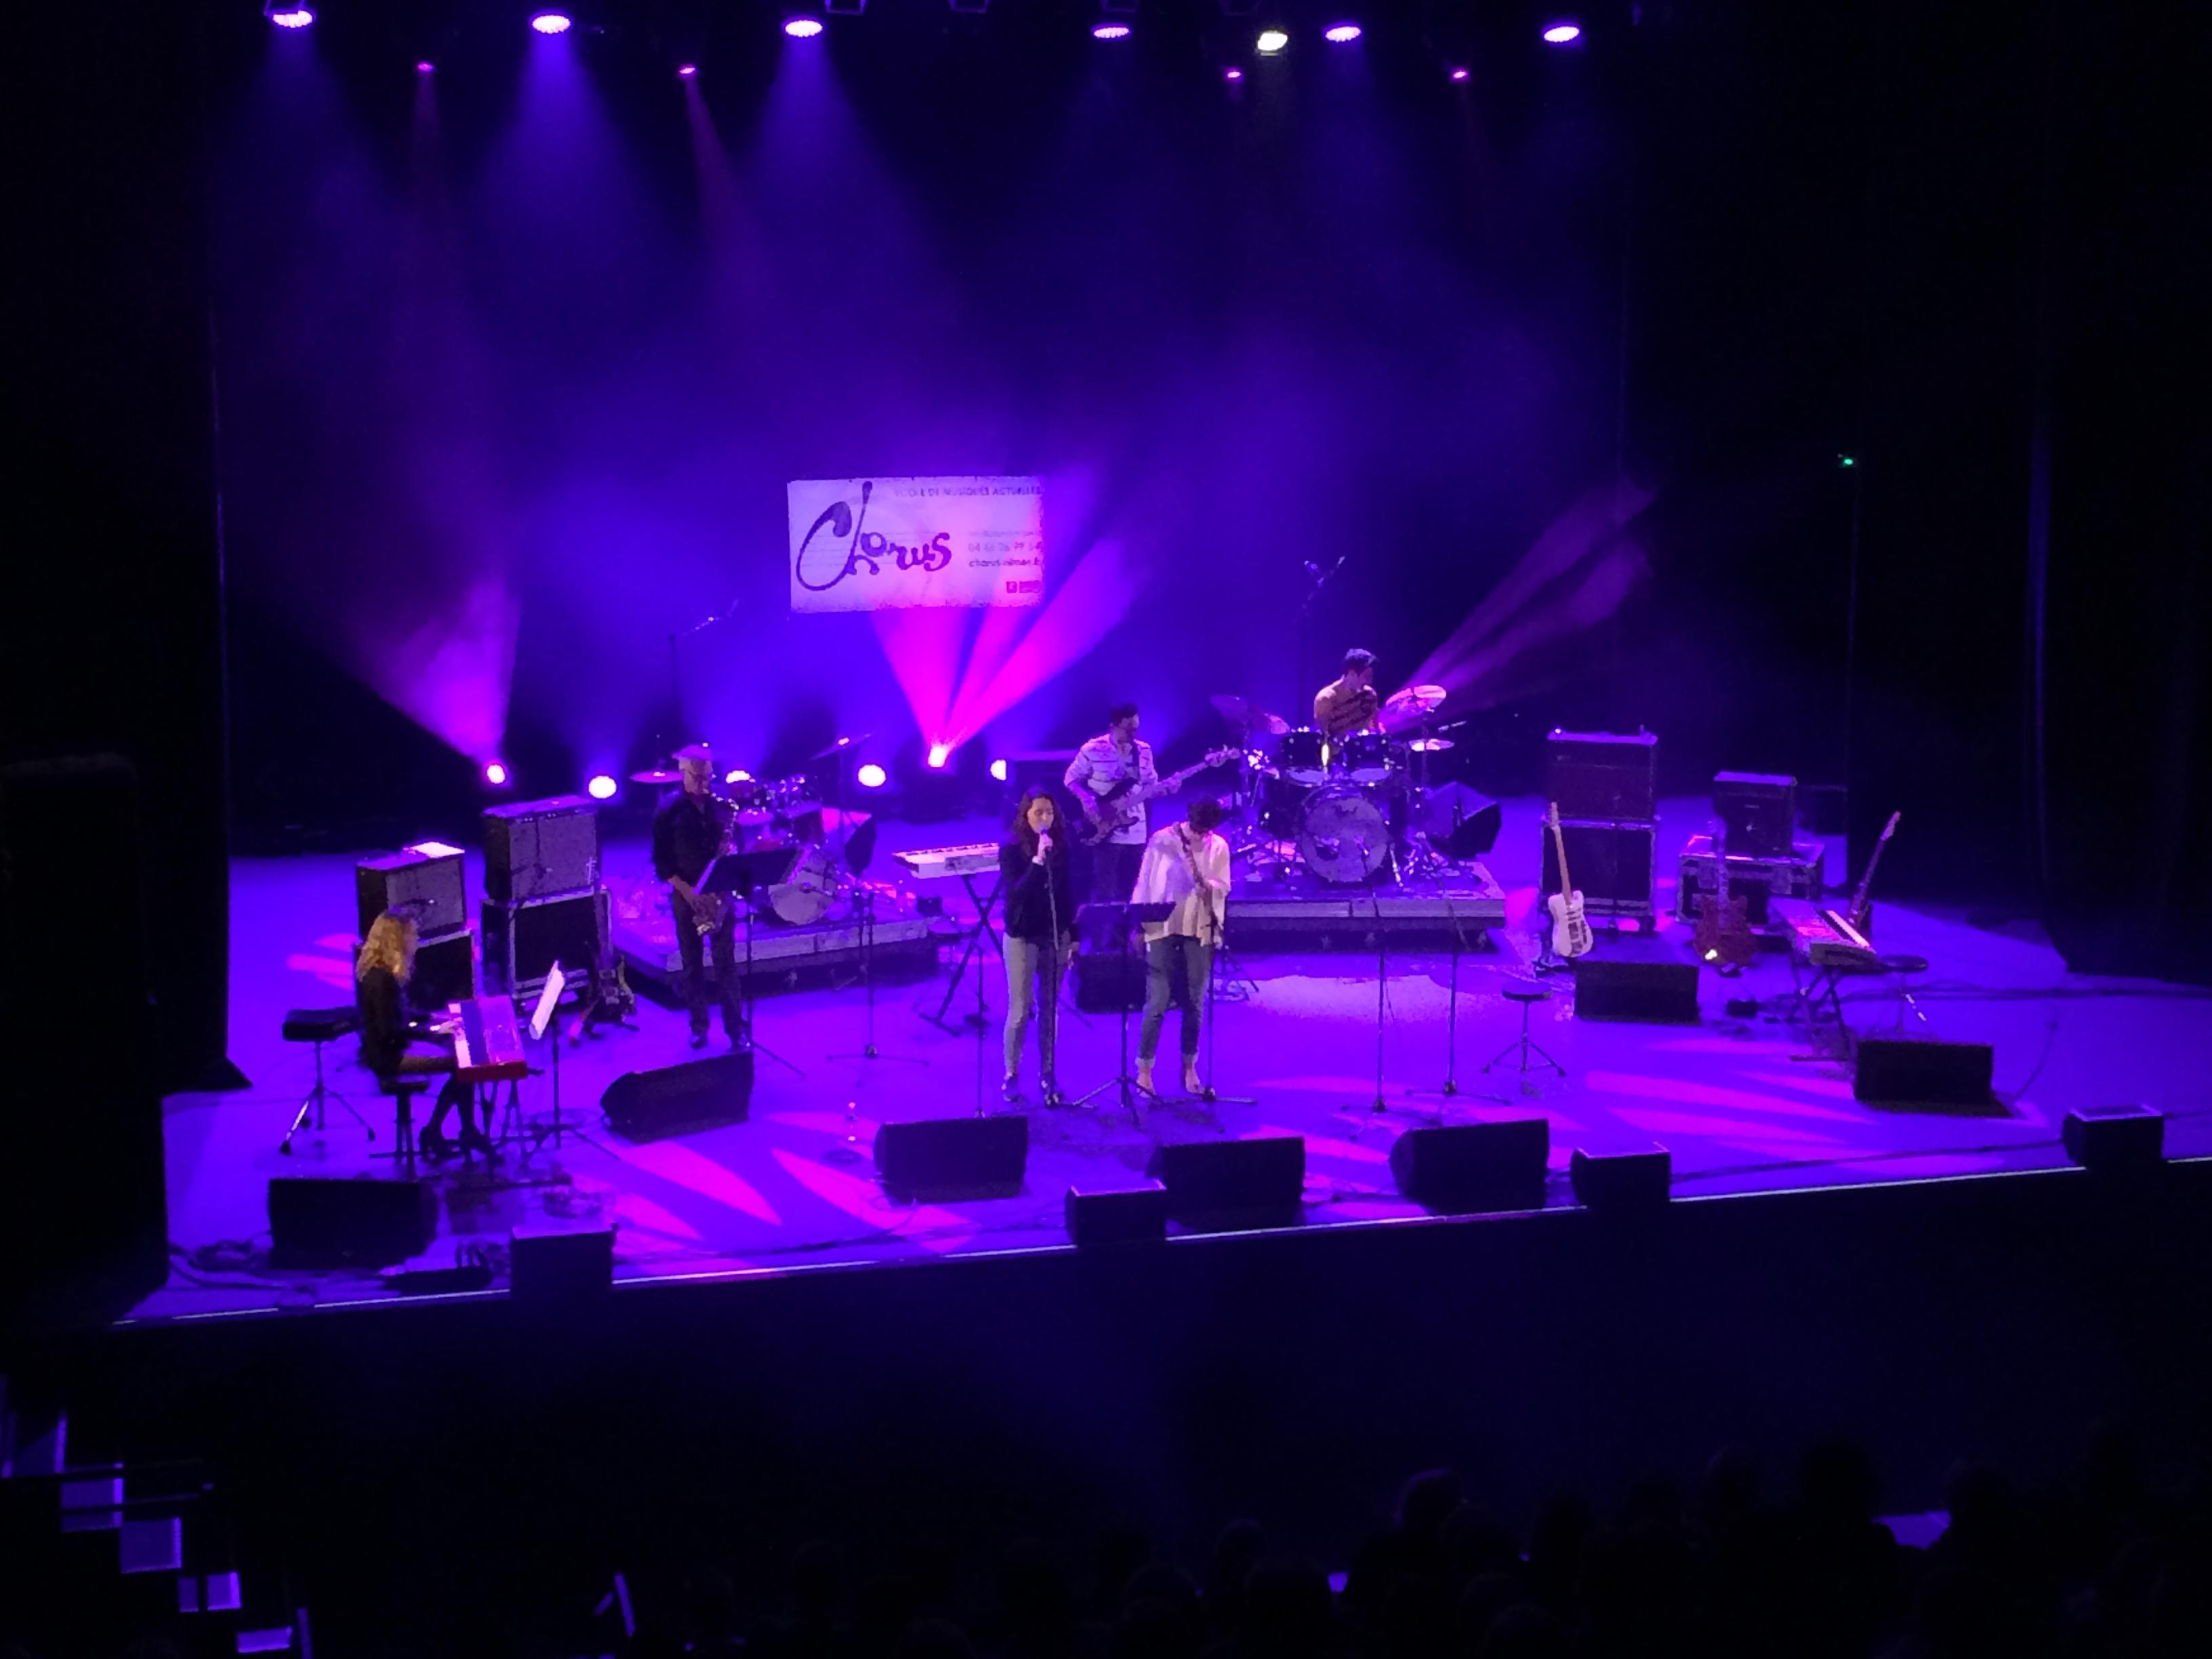 Chorus à Paloma 2015